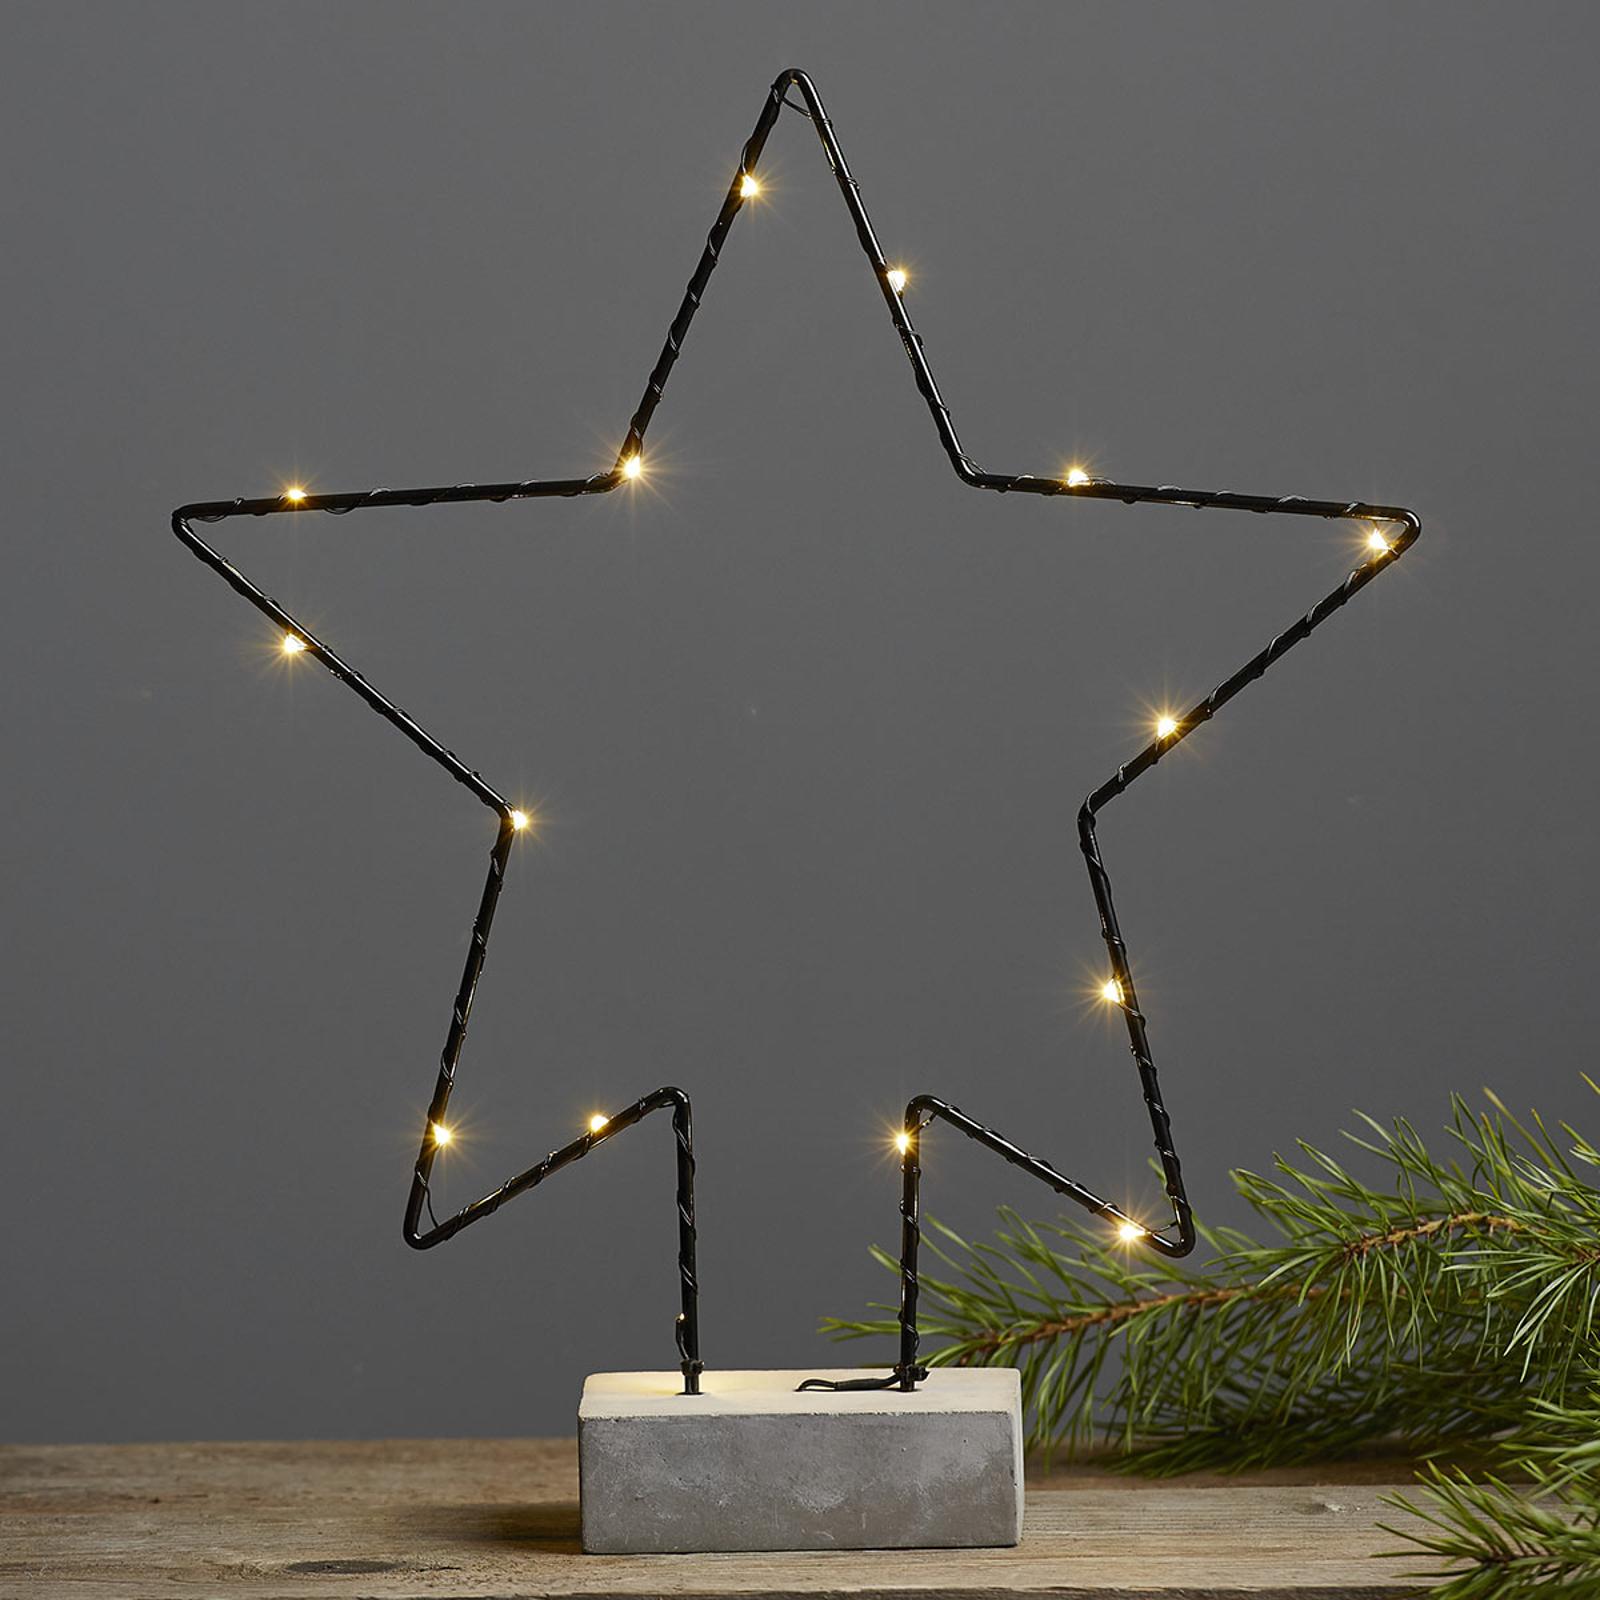 Betonfod dekorationslampe Cemmy stjerneform